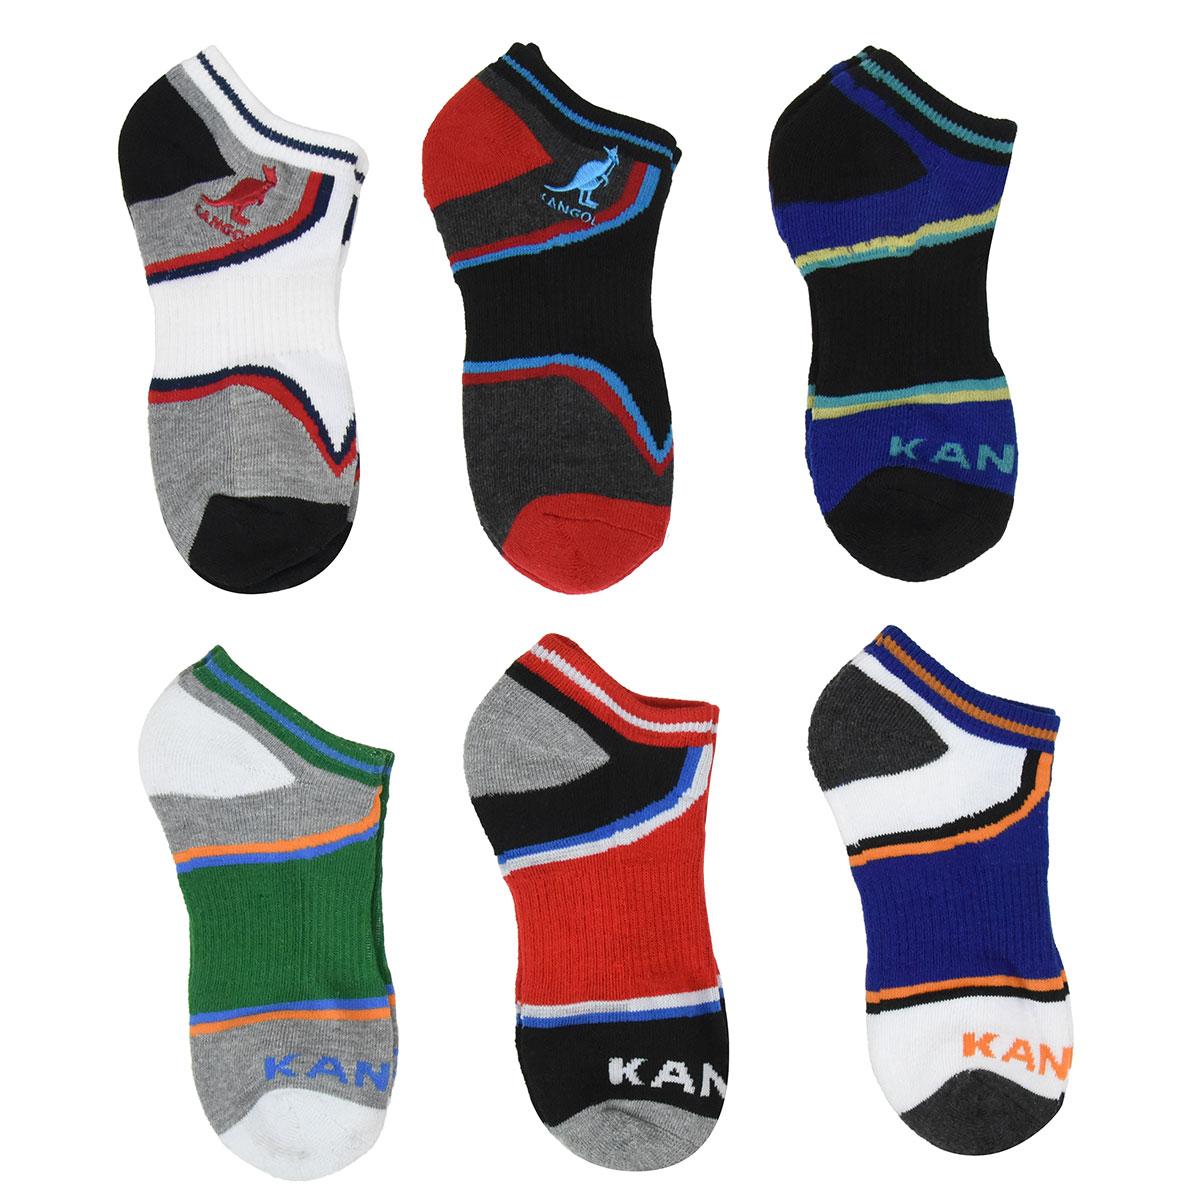 Kangol Kangol Kids Wide Stripe No Show Socks - 6 Pack in Assorted